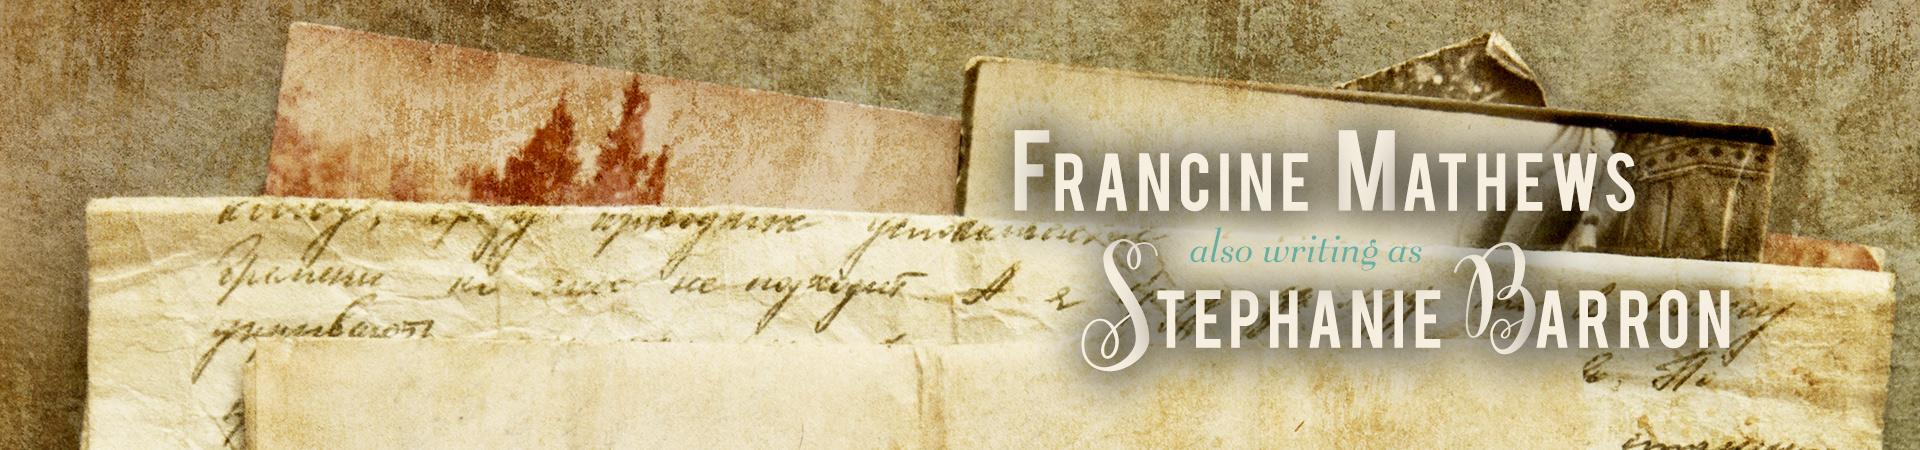 Francine Mathews & Stephanie Barron